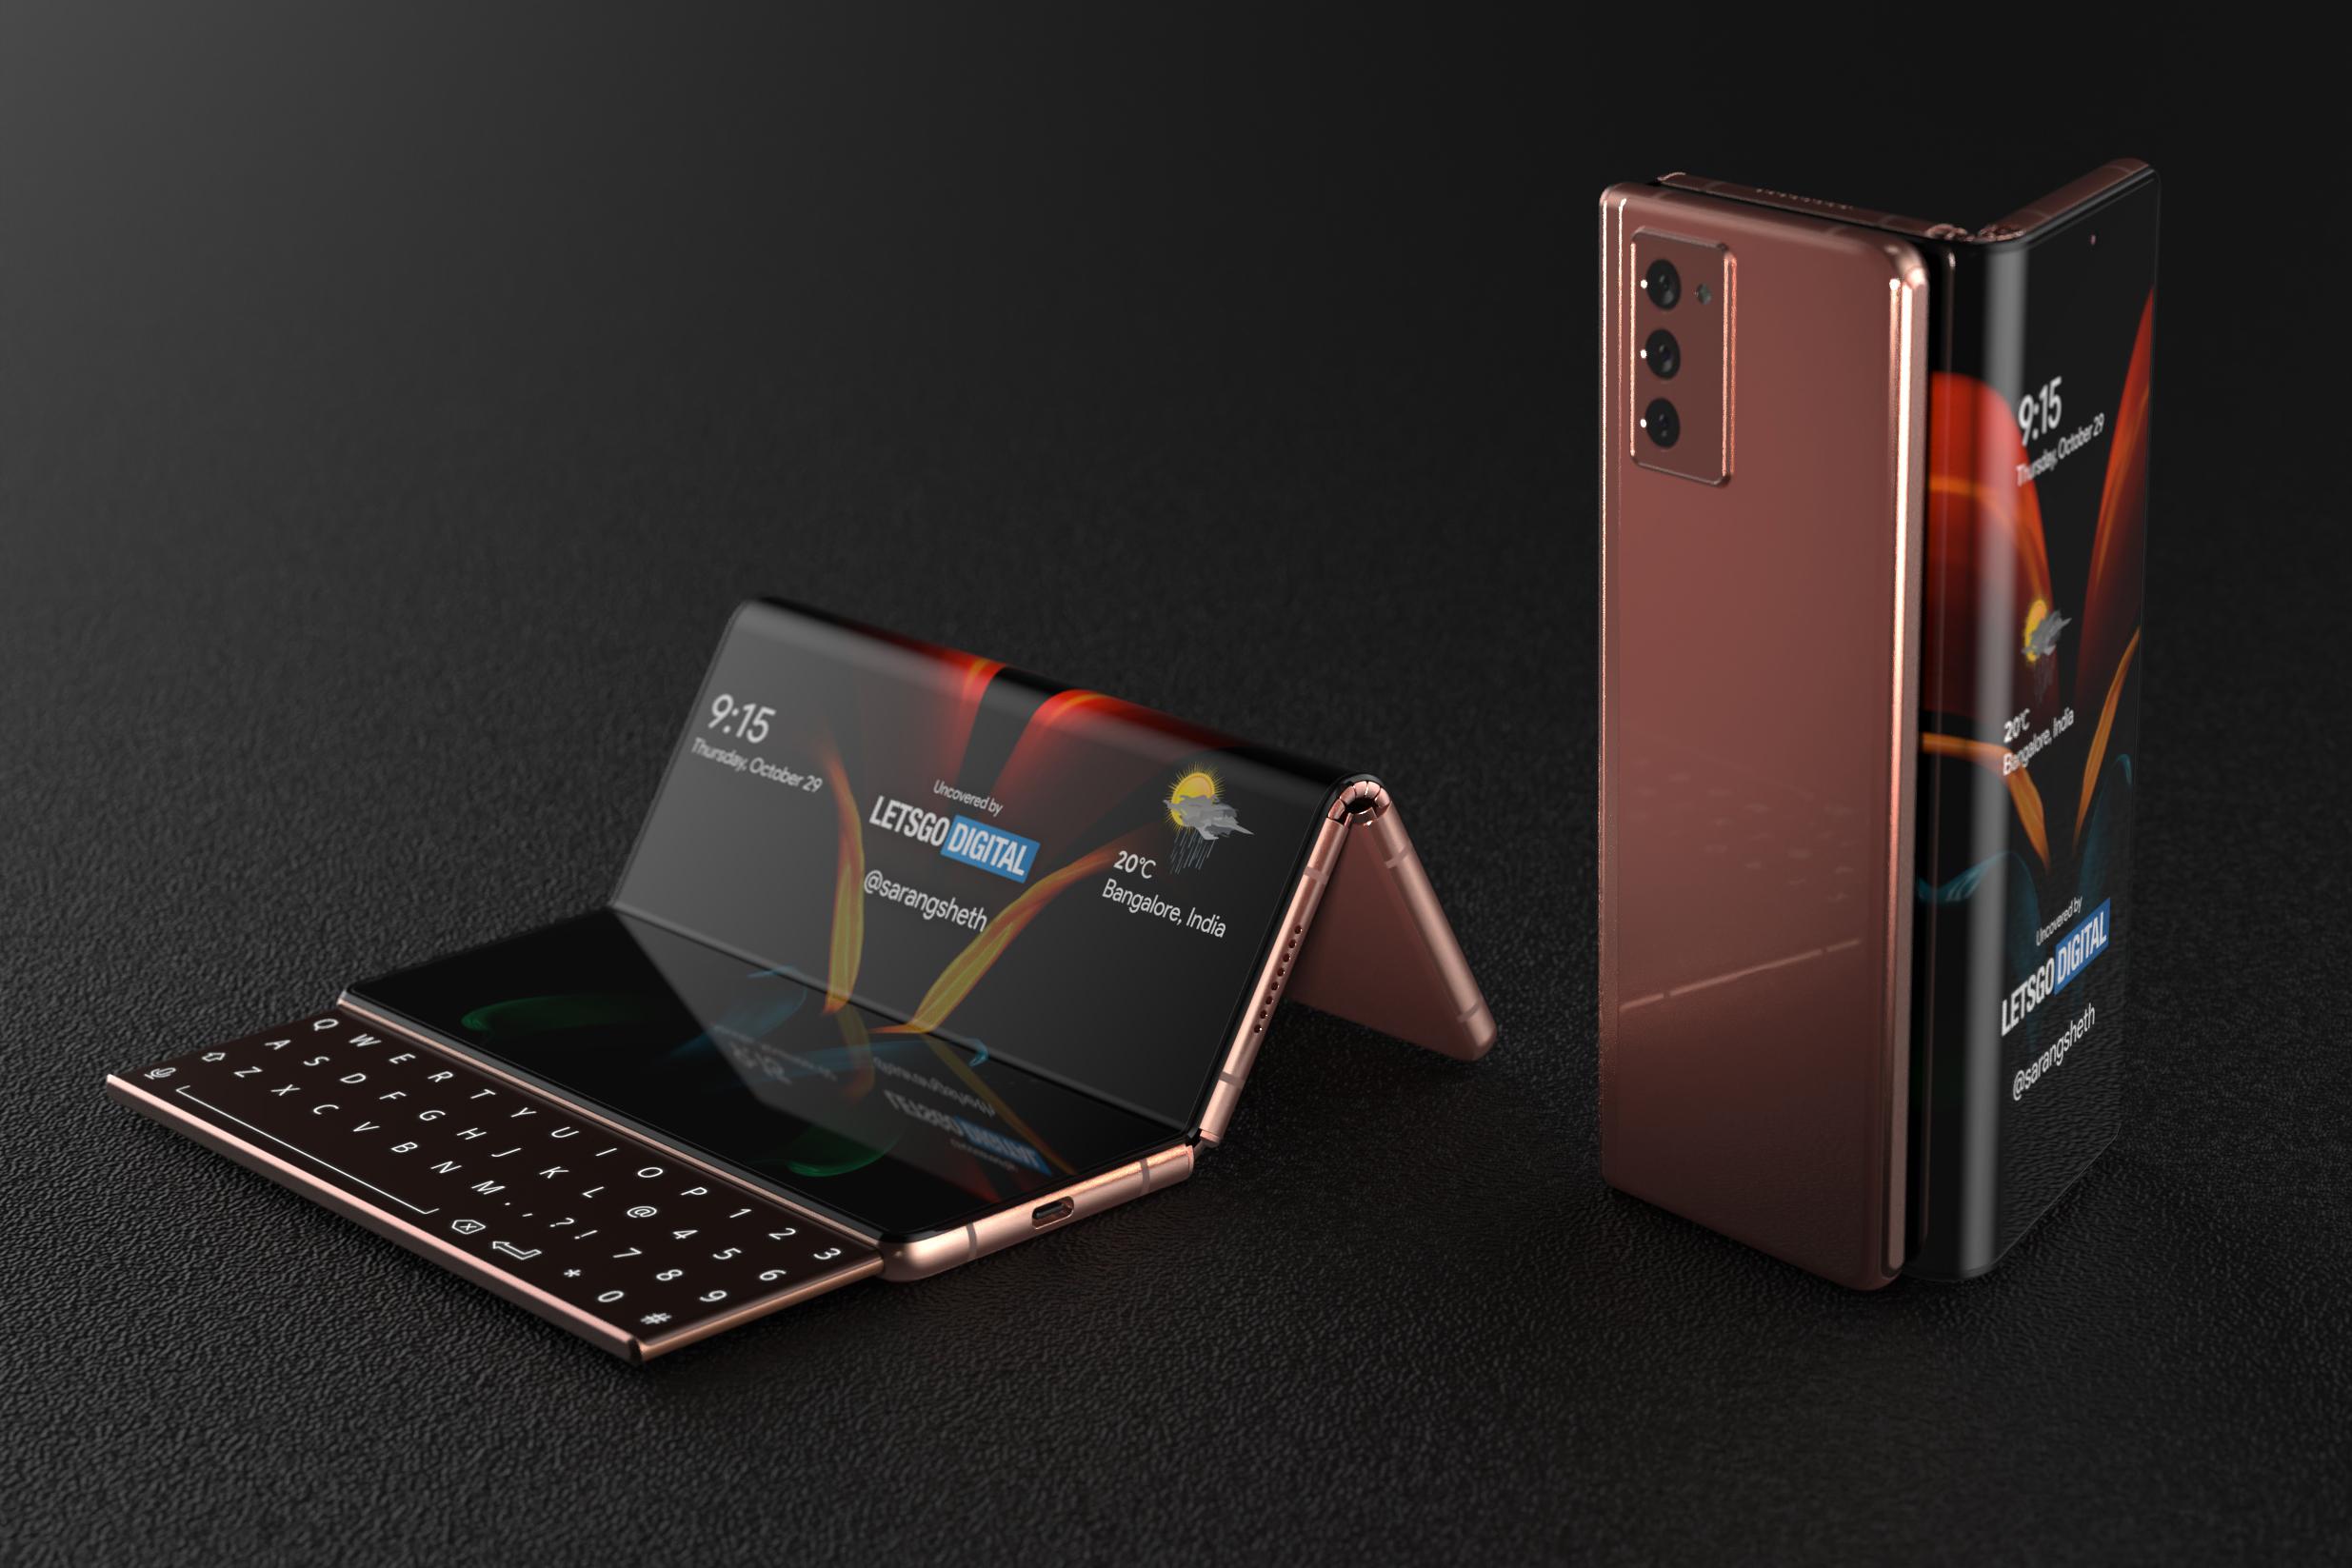 Samsung Galaxy Z Fold with sliding keyboard